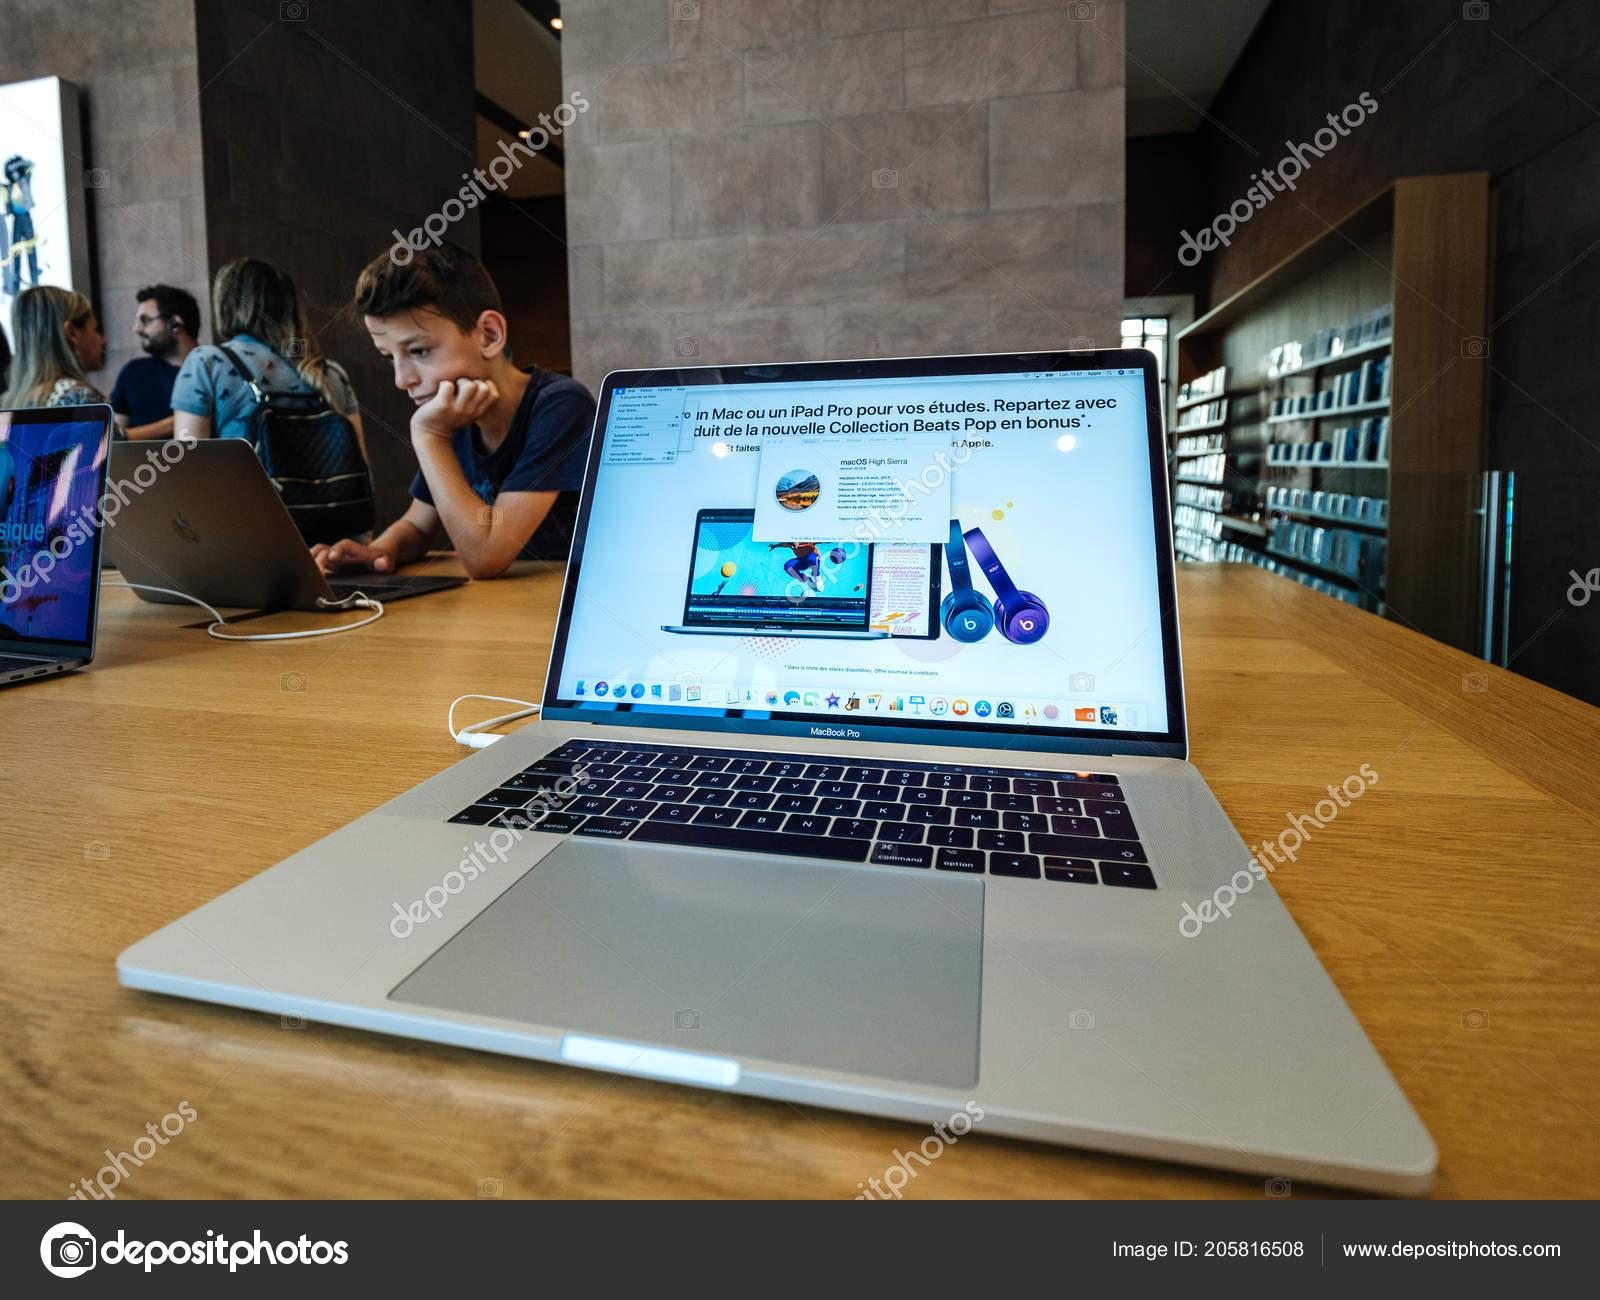 pou kostenlos auf laptop